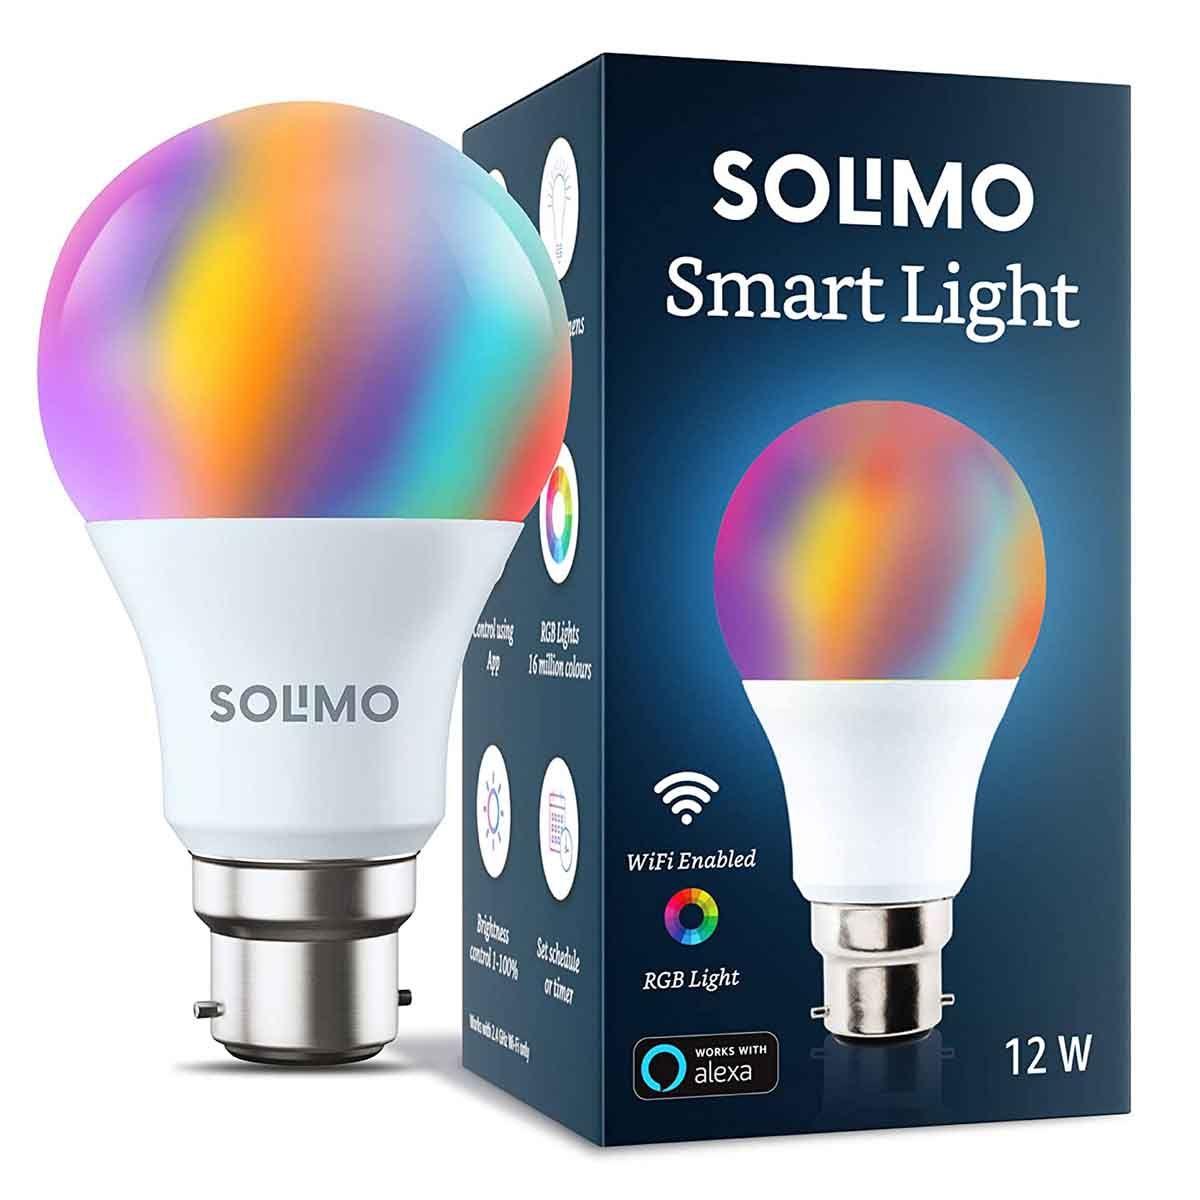 अमेज़न Solimo 12 Watt Smart LED Light